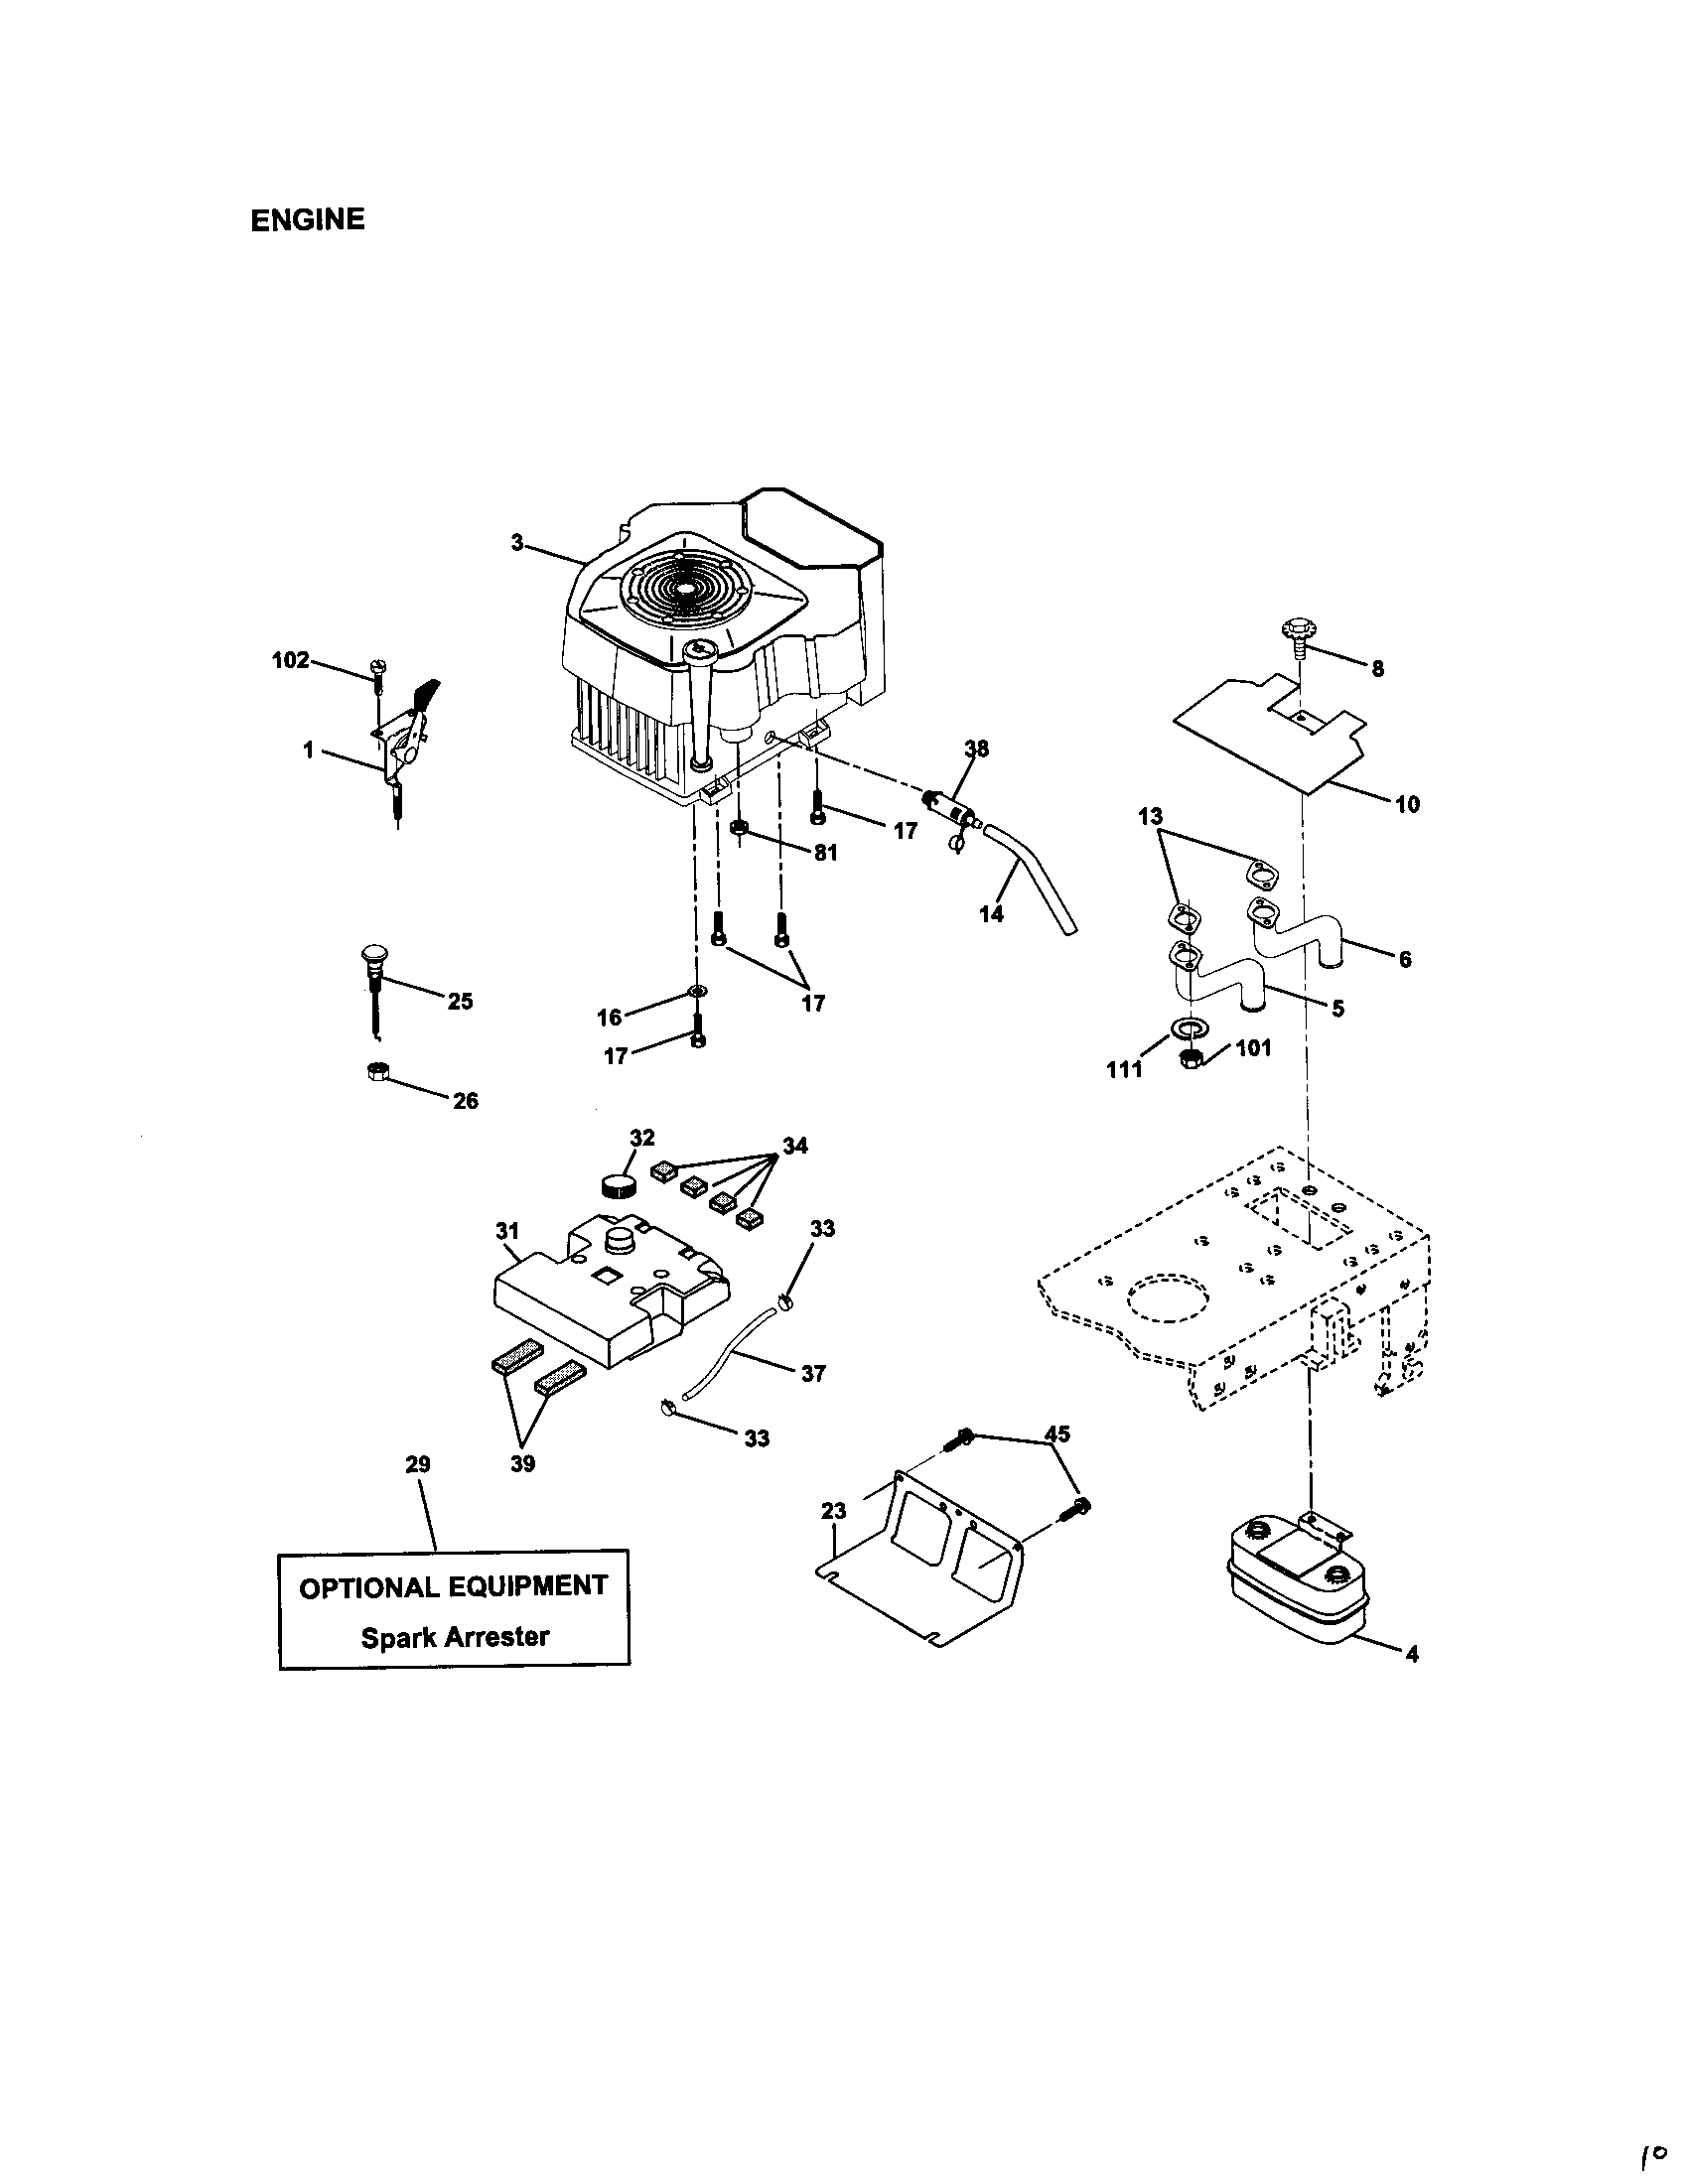 engine diagram parts list for model 917272242 craftsman parts mower tractor parts